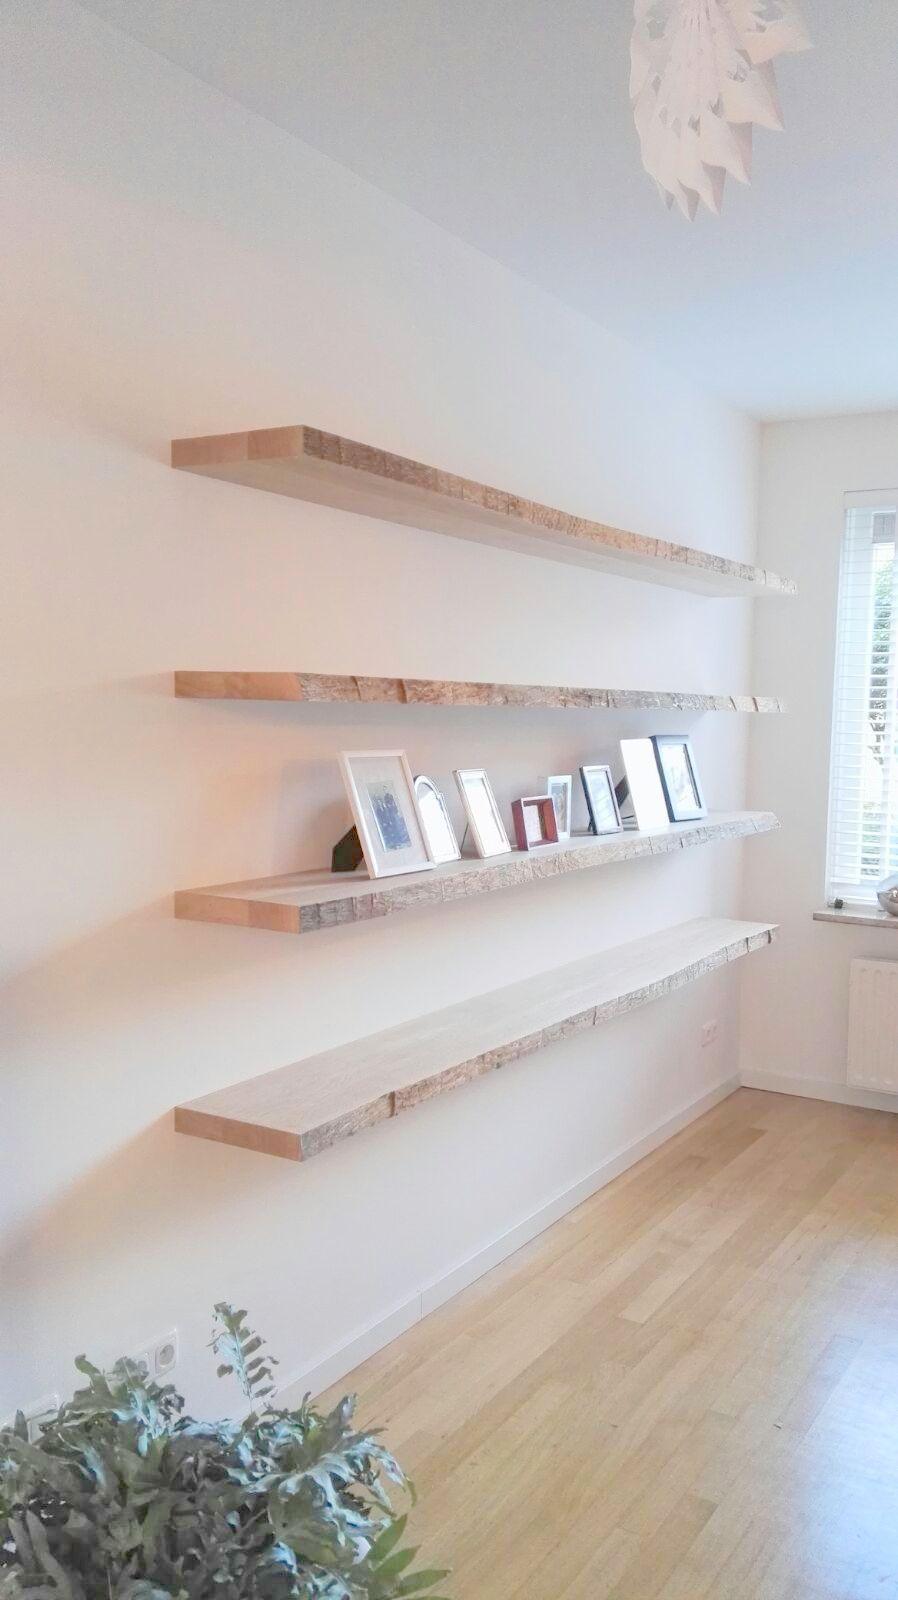 Zwevende Wandplanken Floatingshelves In 2020 Schlafzimmer Regale Zuhause Dekoration Wohnaccessoires